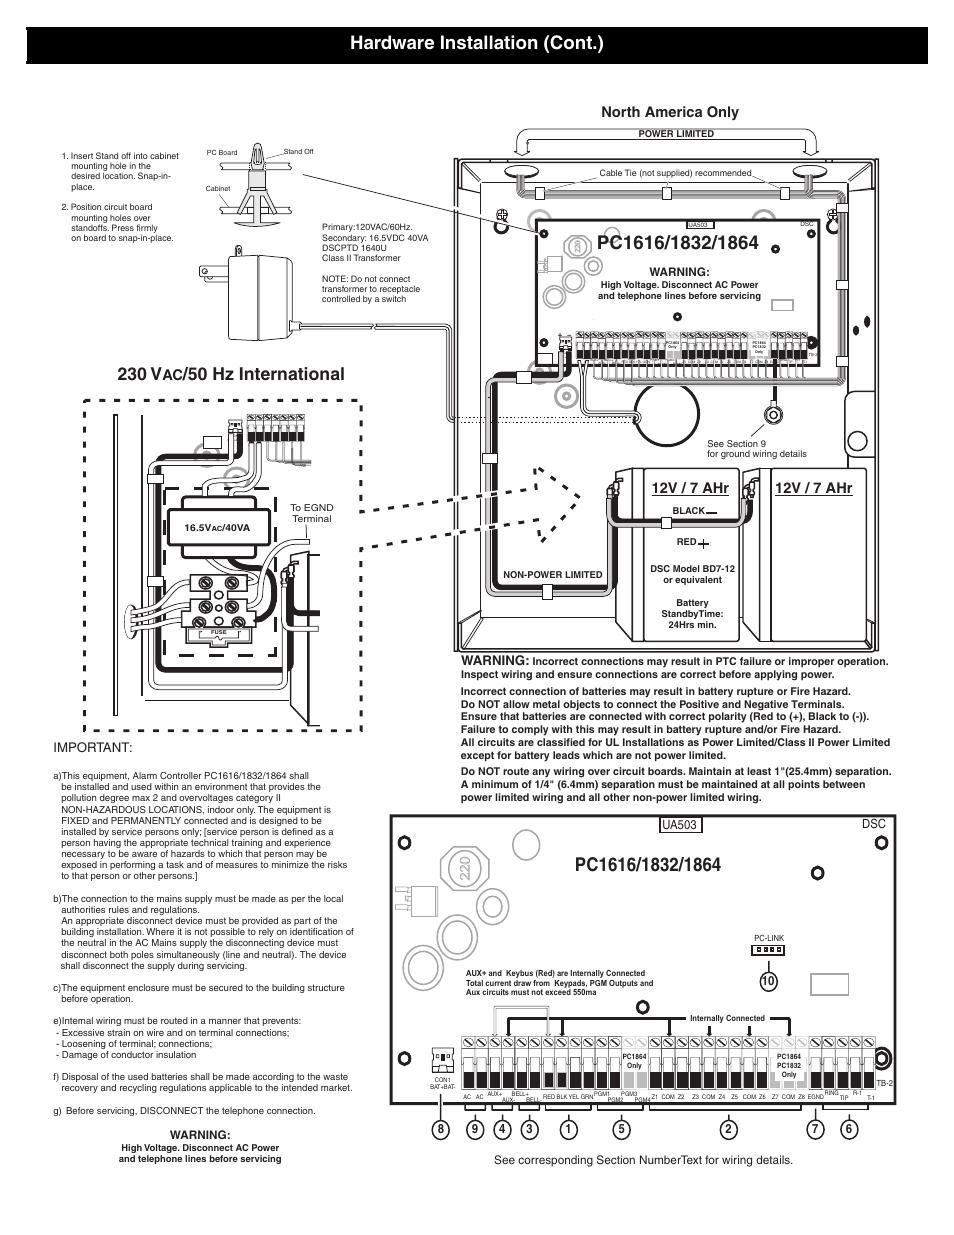 dsc power series pc1616 wiring diagram